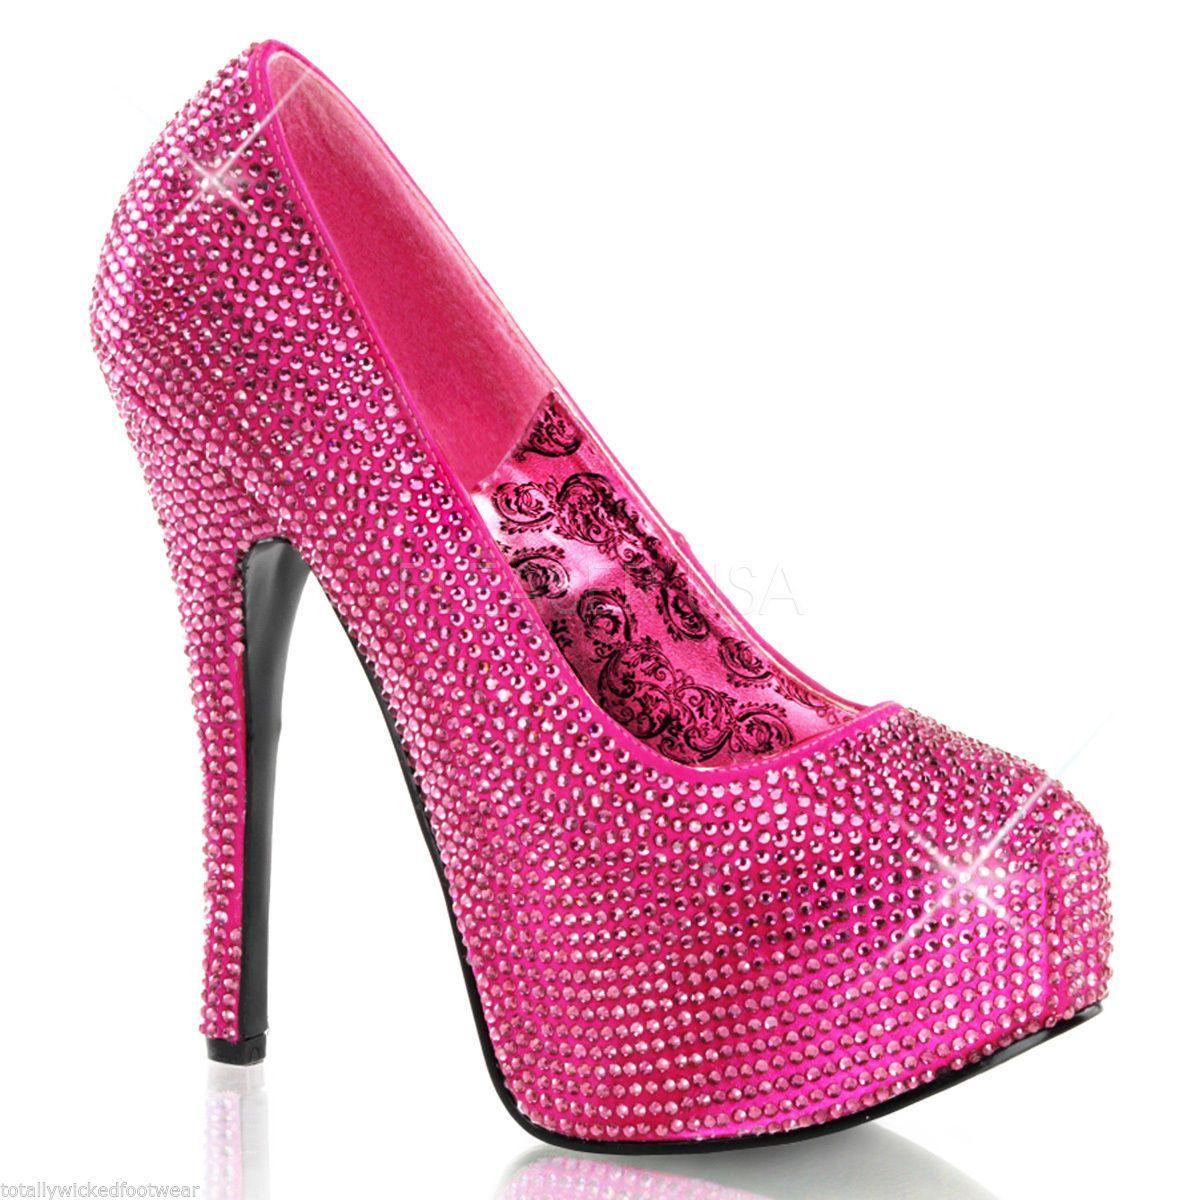 Teeze 06R Hot Pink Satin & Rhinestone Platform 6″ Heel Pump Size 8